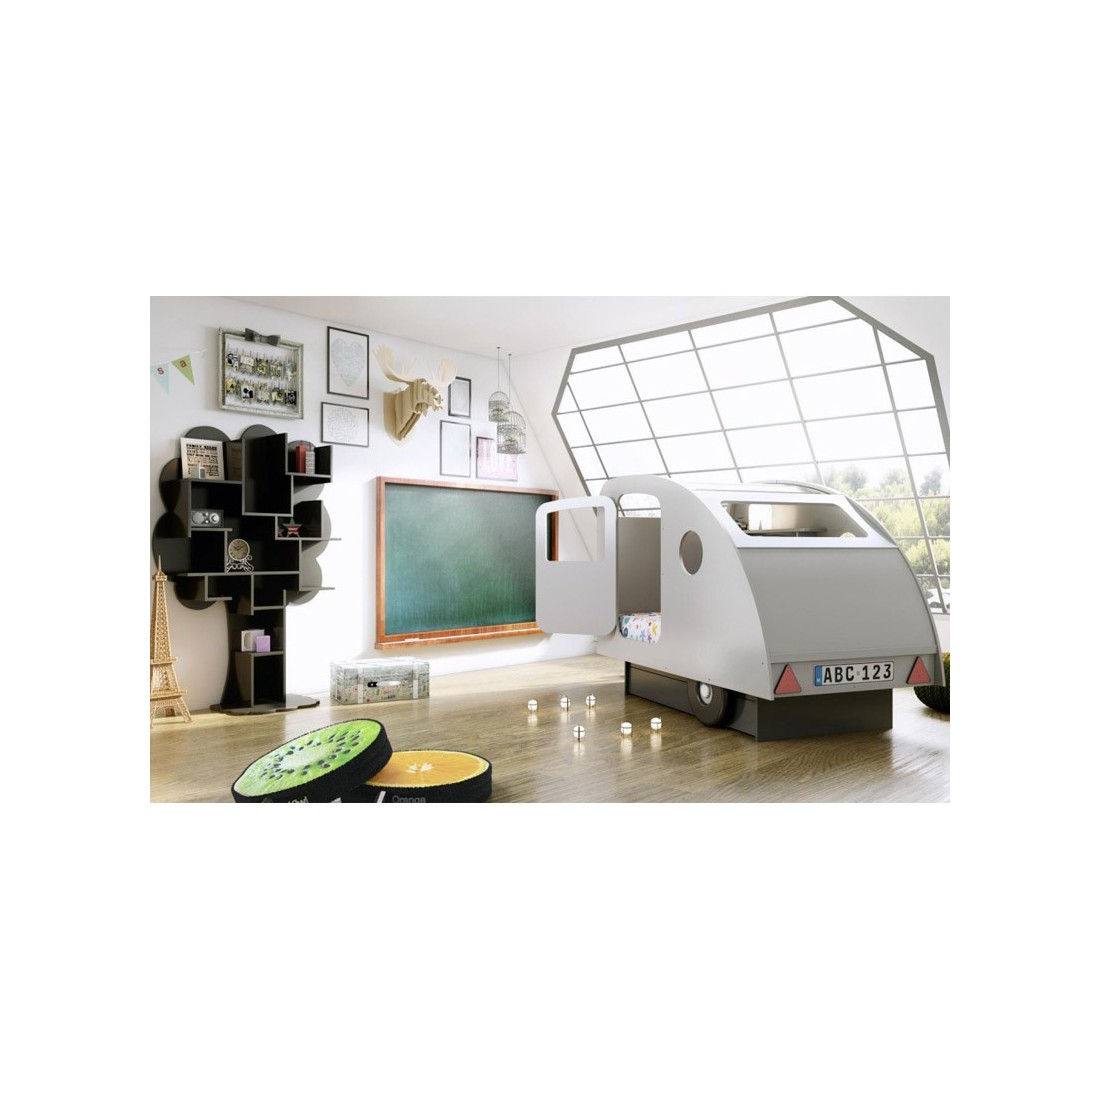 lit enfant caravane mathy by bols ma chambramoi. Black Bedroom Furniture Sets. Home Design Ideas